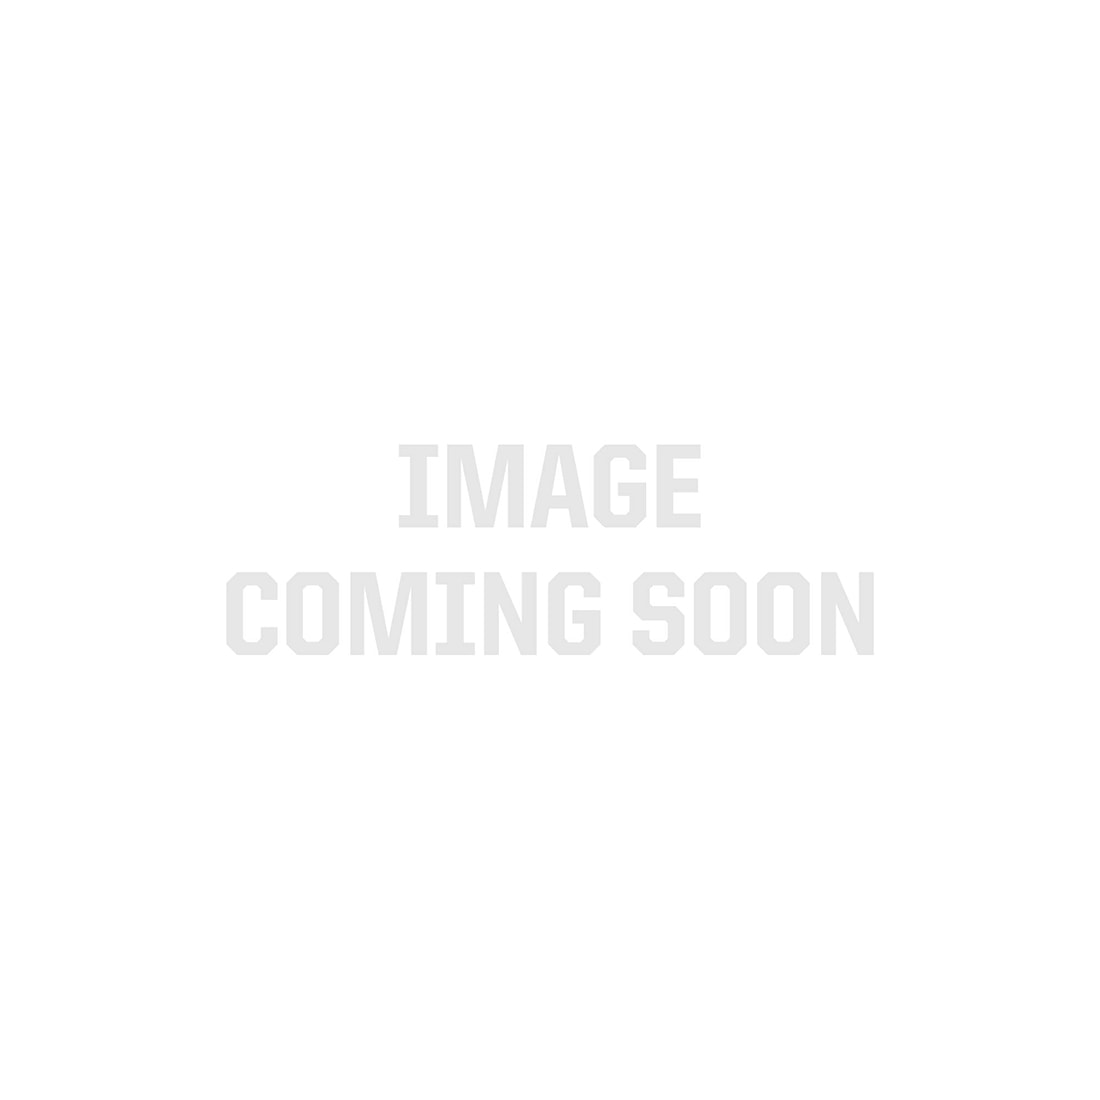 S14 Frosted Glass Dimmable LED Light Bulb, E26 (Medium) Base, 1.4 watt (Blue)